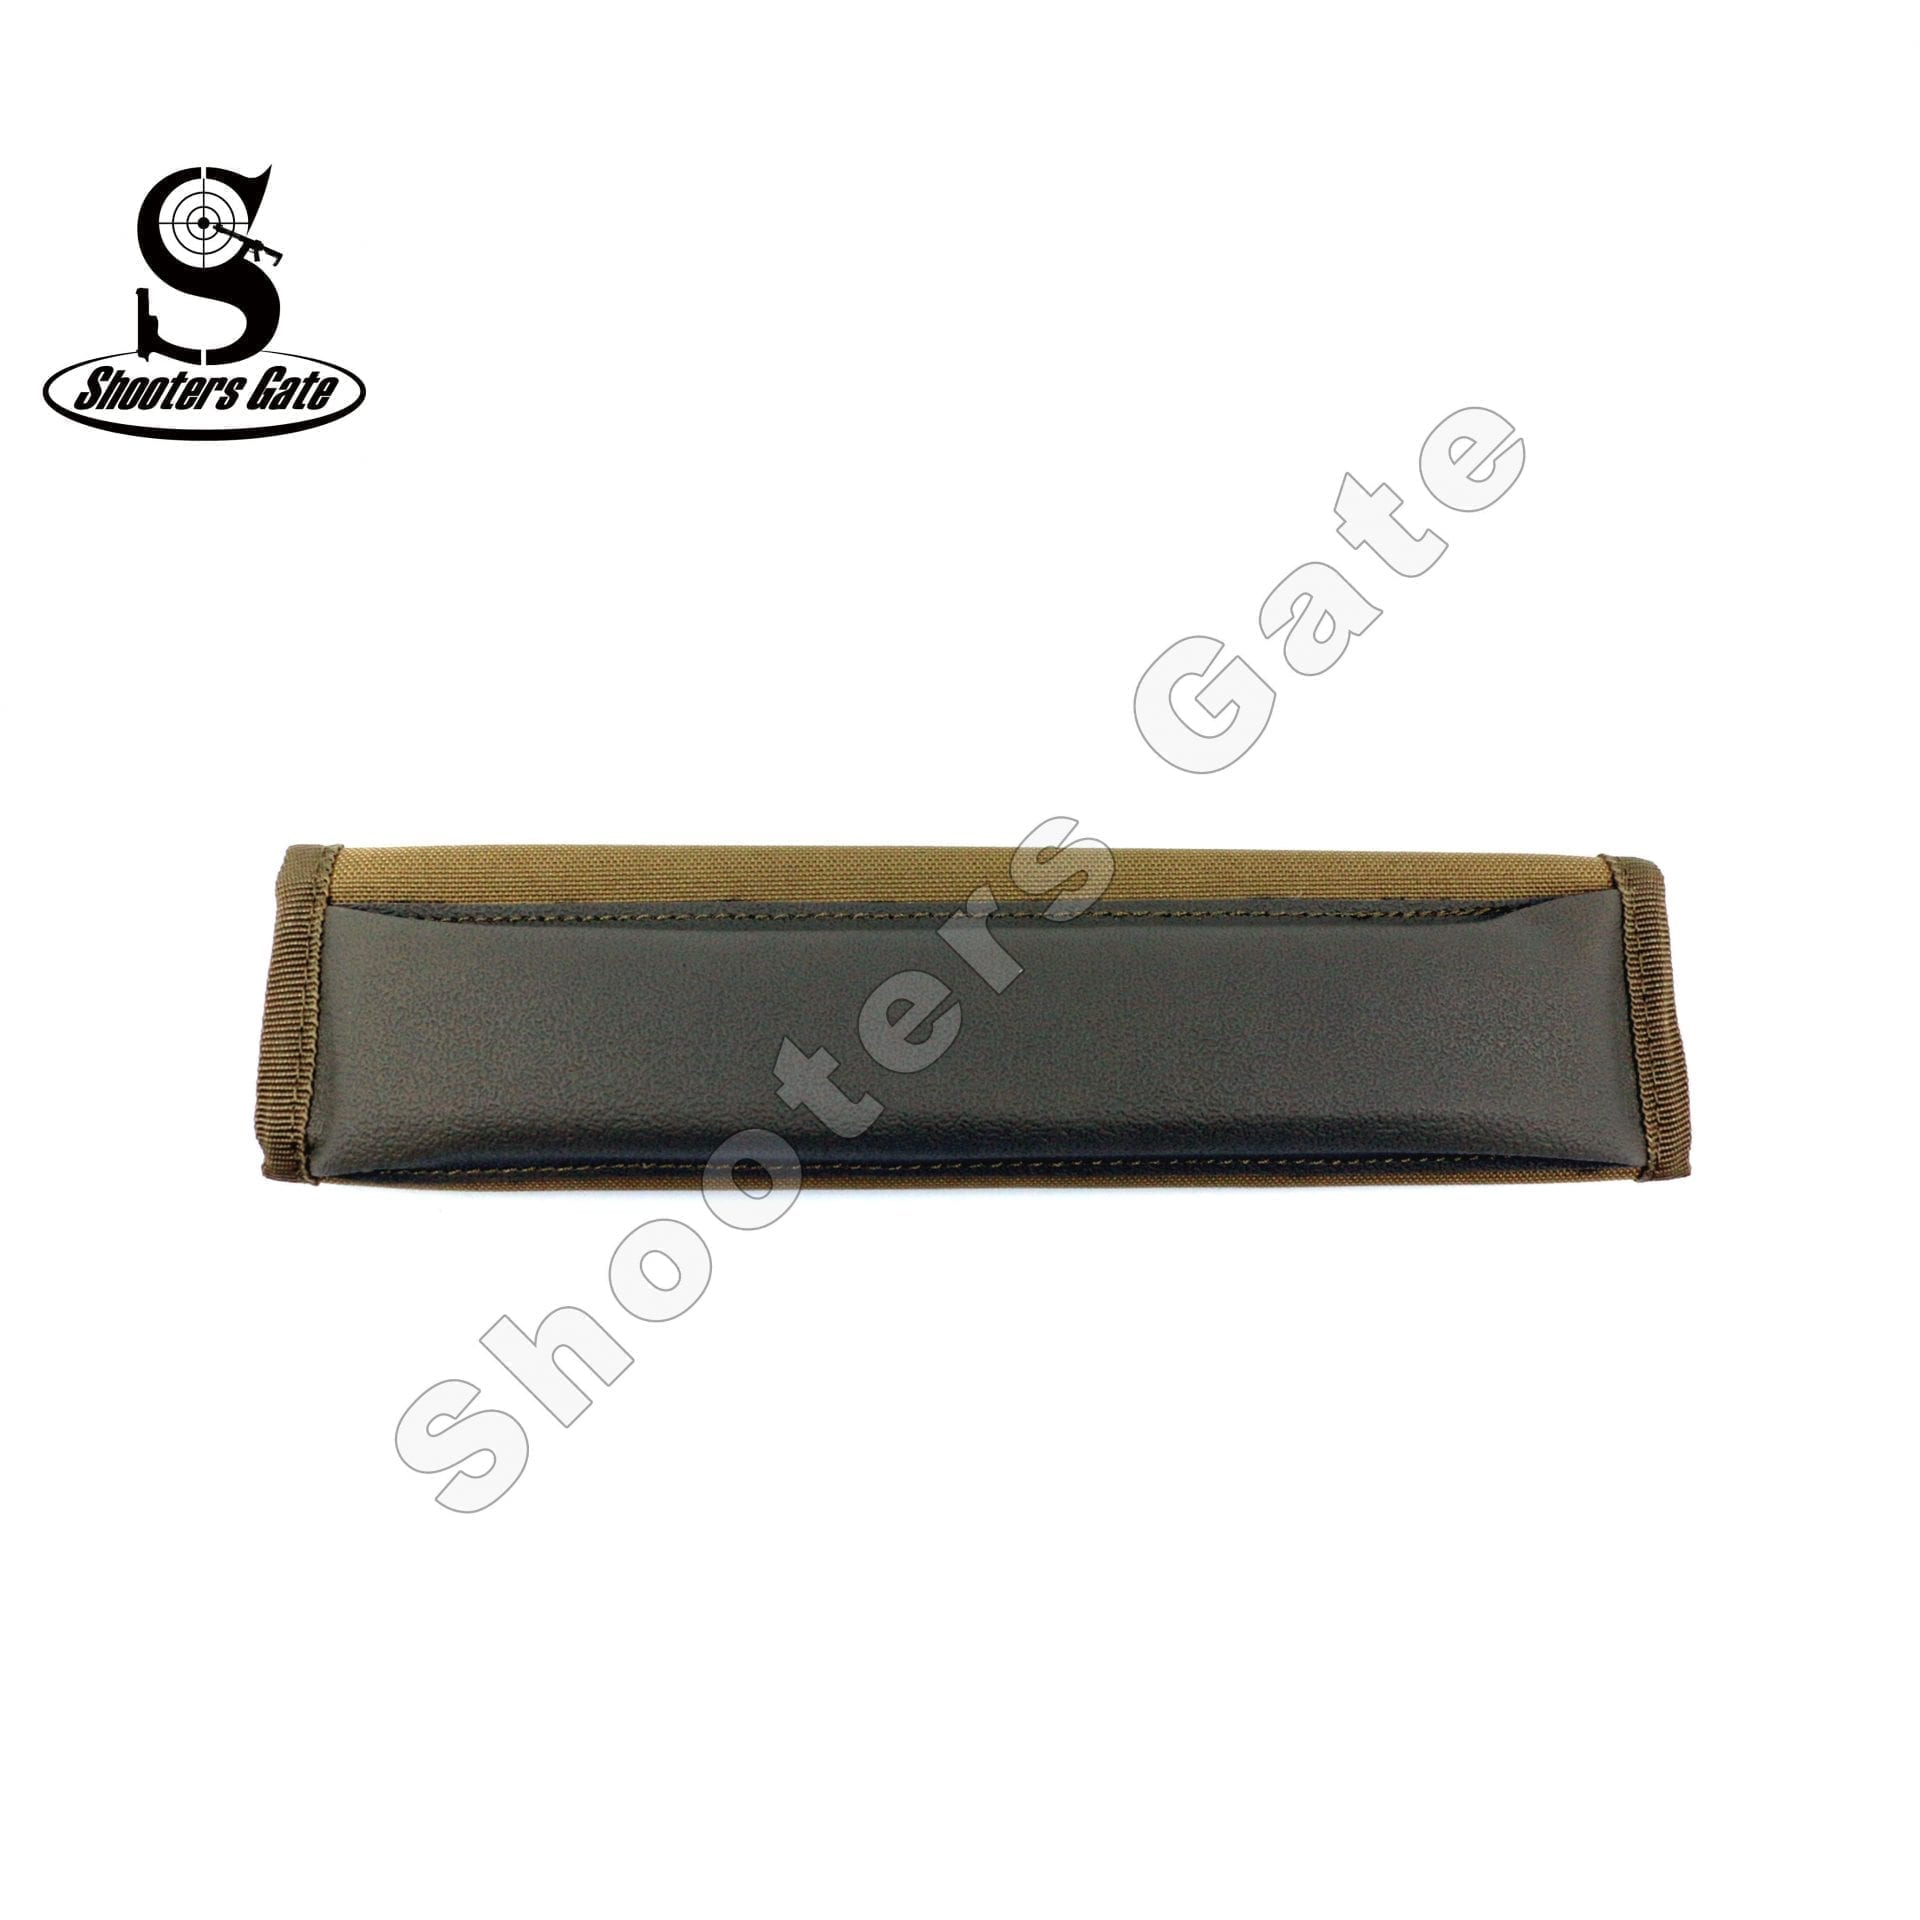 Strap Shoulder Comfort Pad TAN